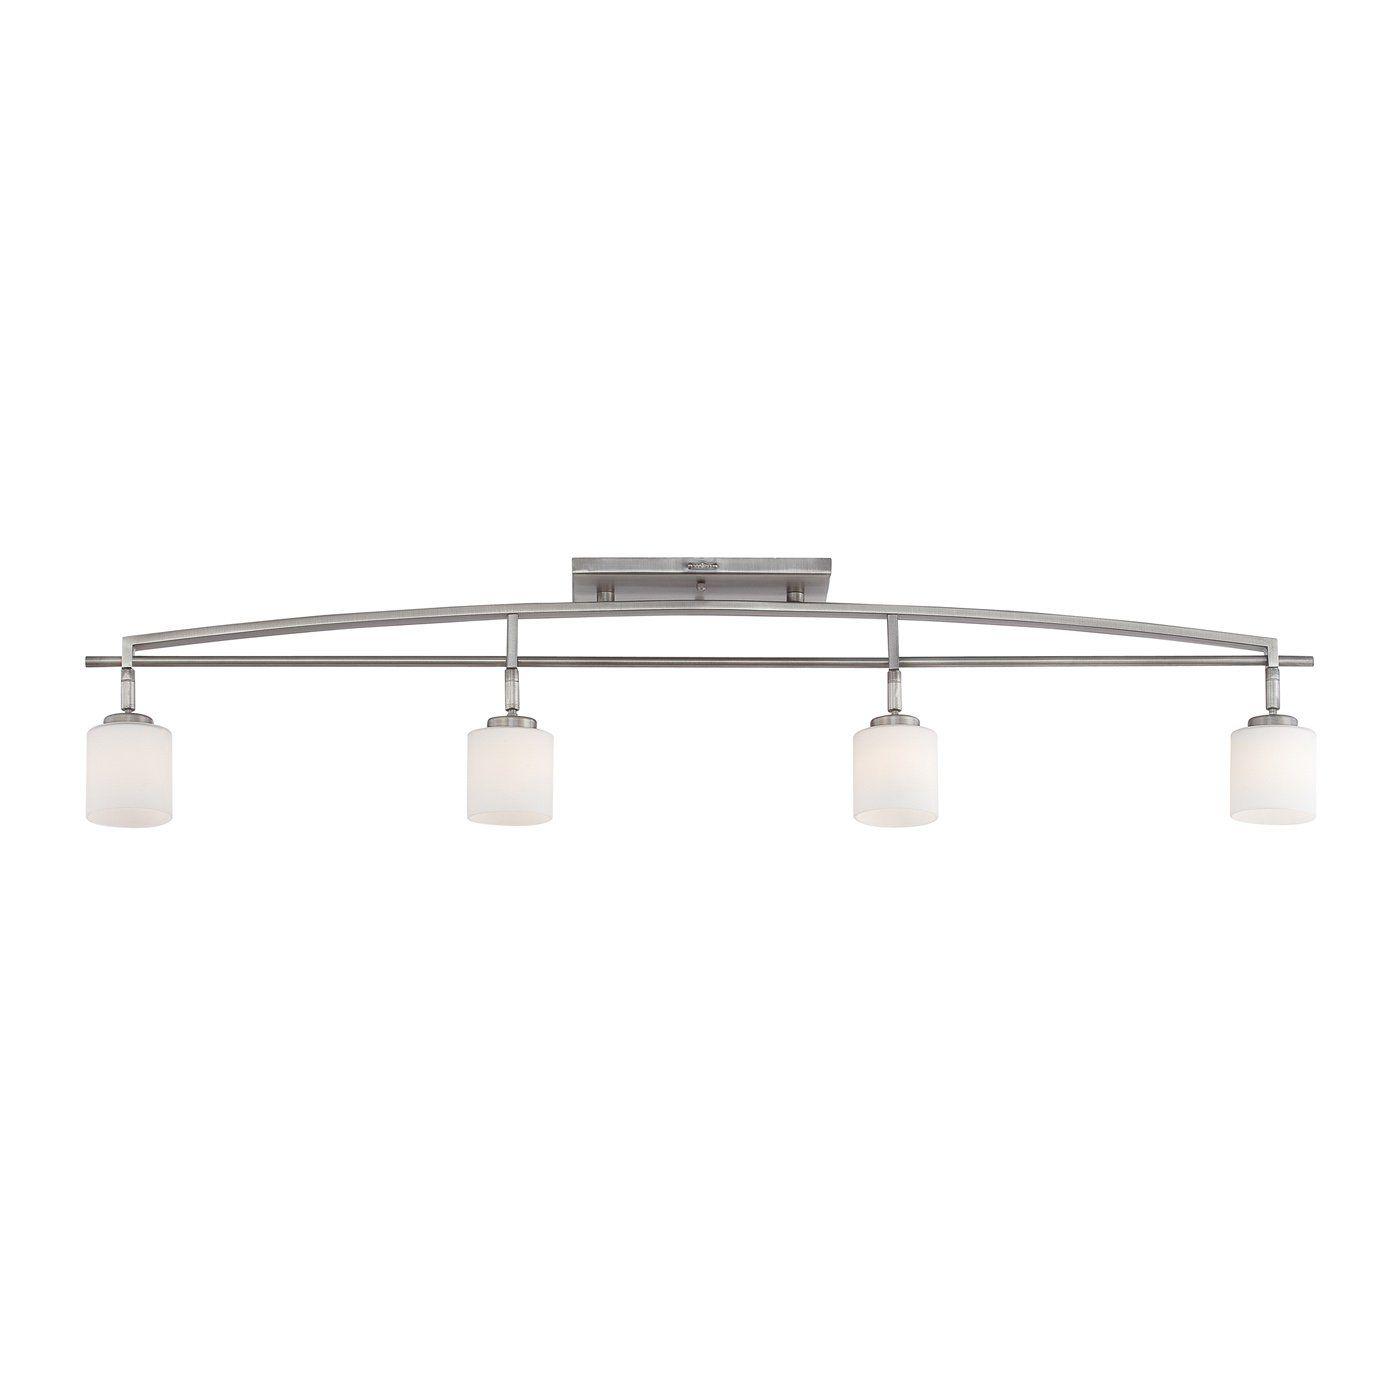 track lighting kits light atg stores. Quoizel TY1404 4 Light Taylor Fixed Track Lighting Kit - ATG Stores Kits Atg Pinterest